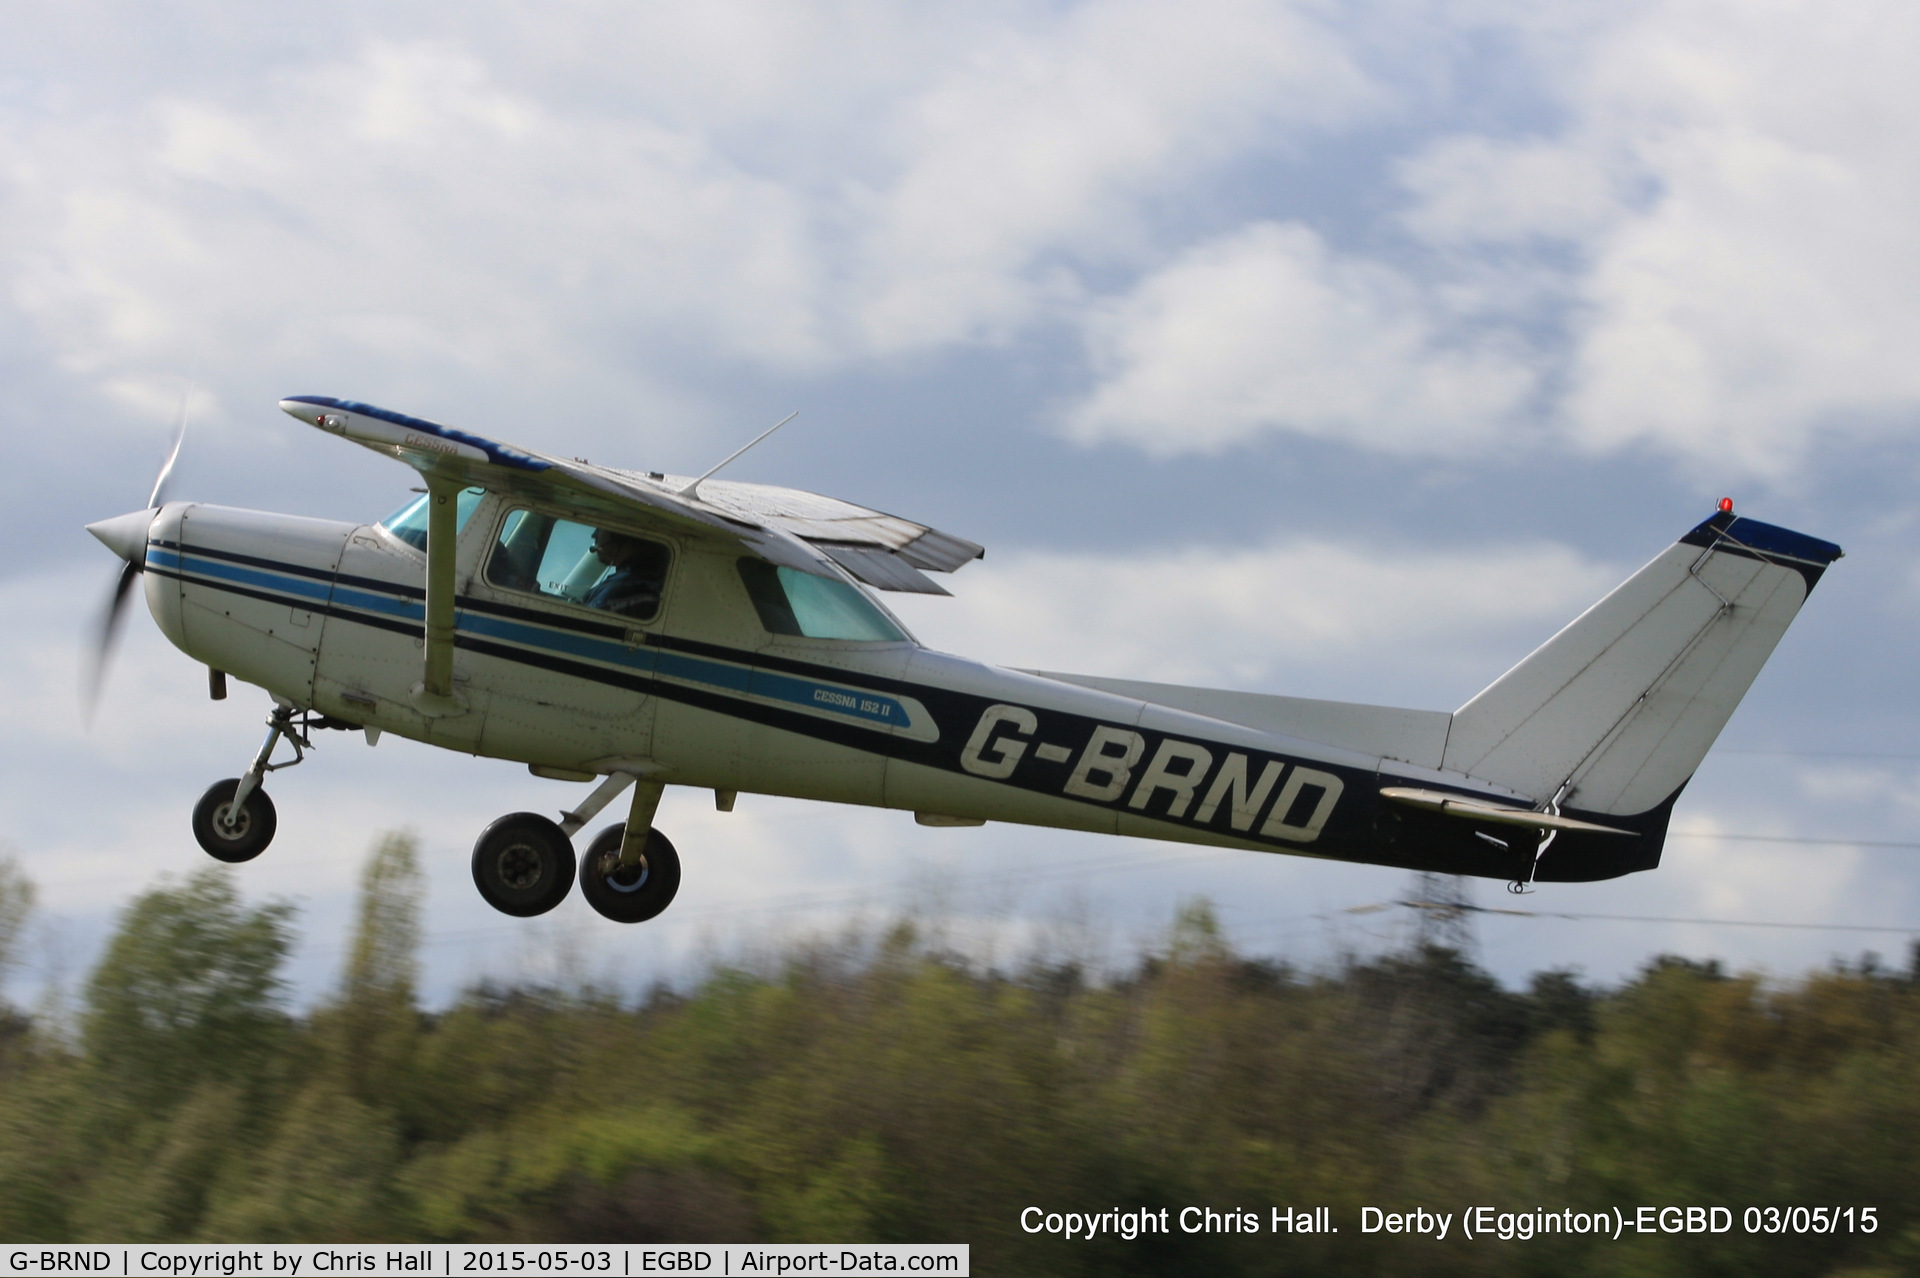 G-BRND, 1979 Cessna 152 C/N 152-83776, Derby resident